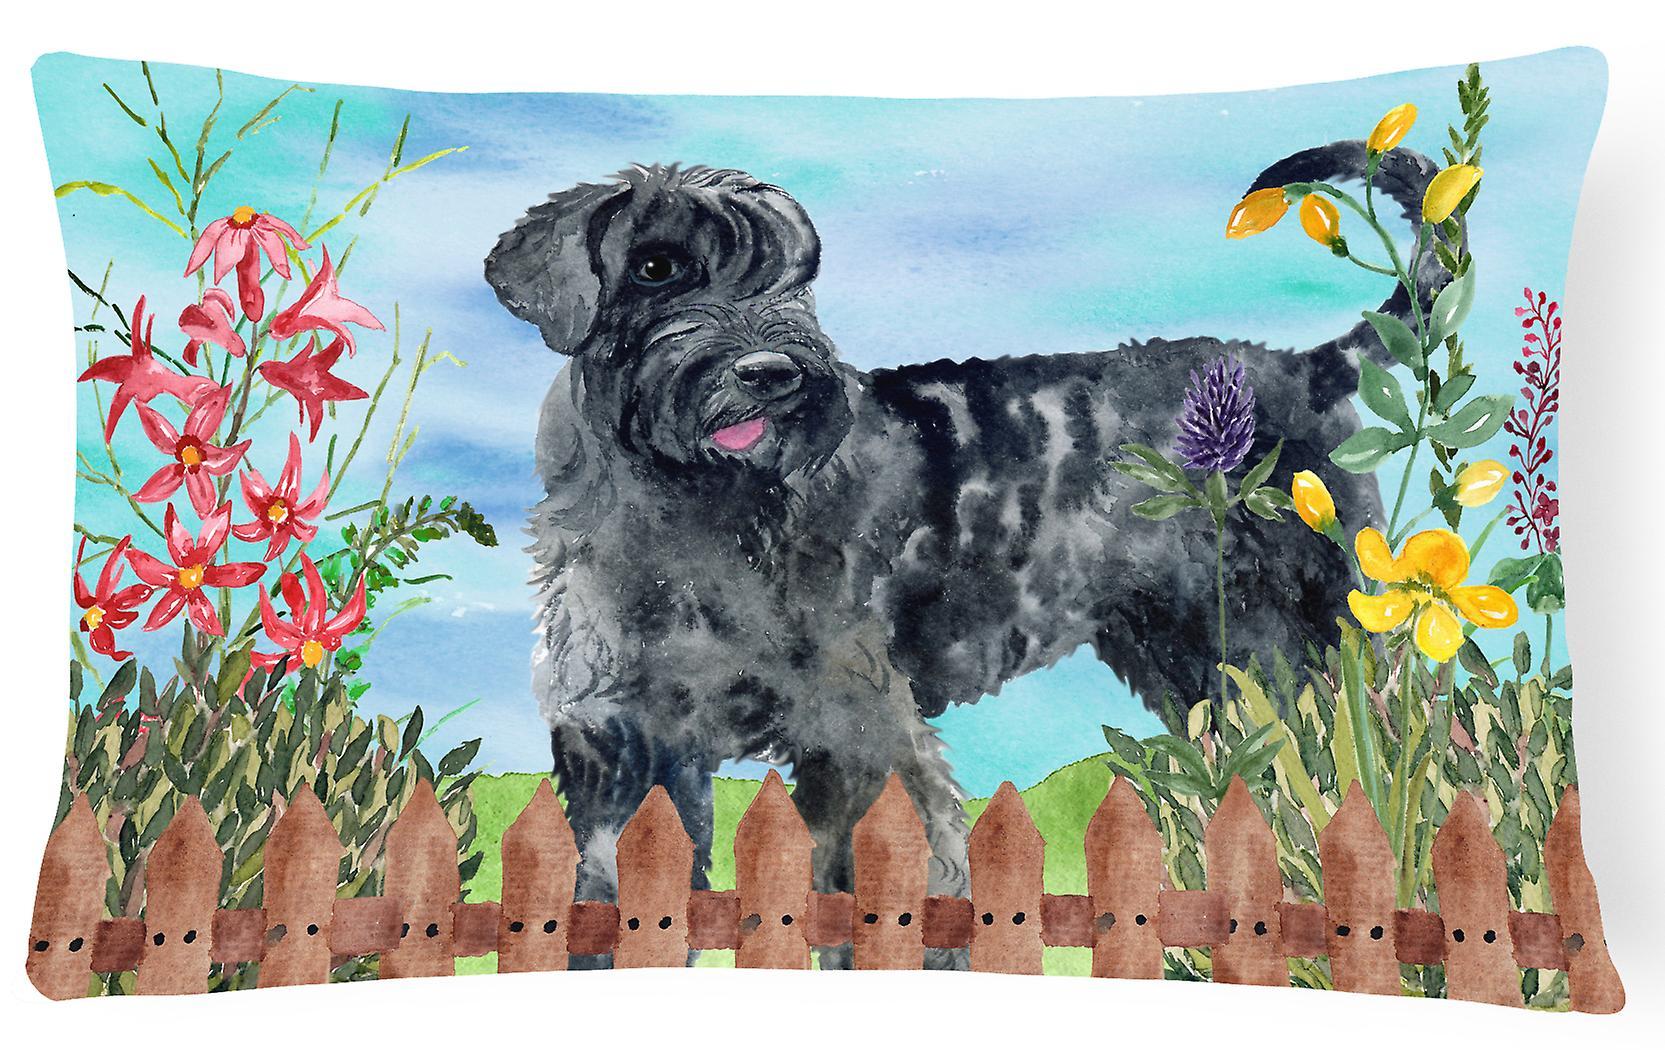 Giant Fabric Canvas Spring Pillow Schnauzer Decorative UzGqMSVp